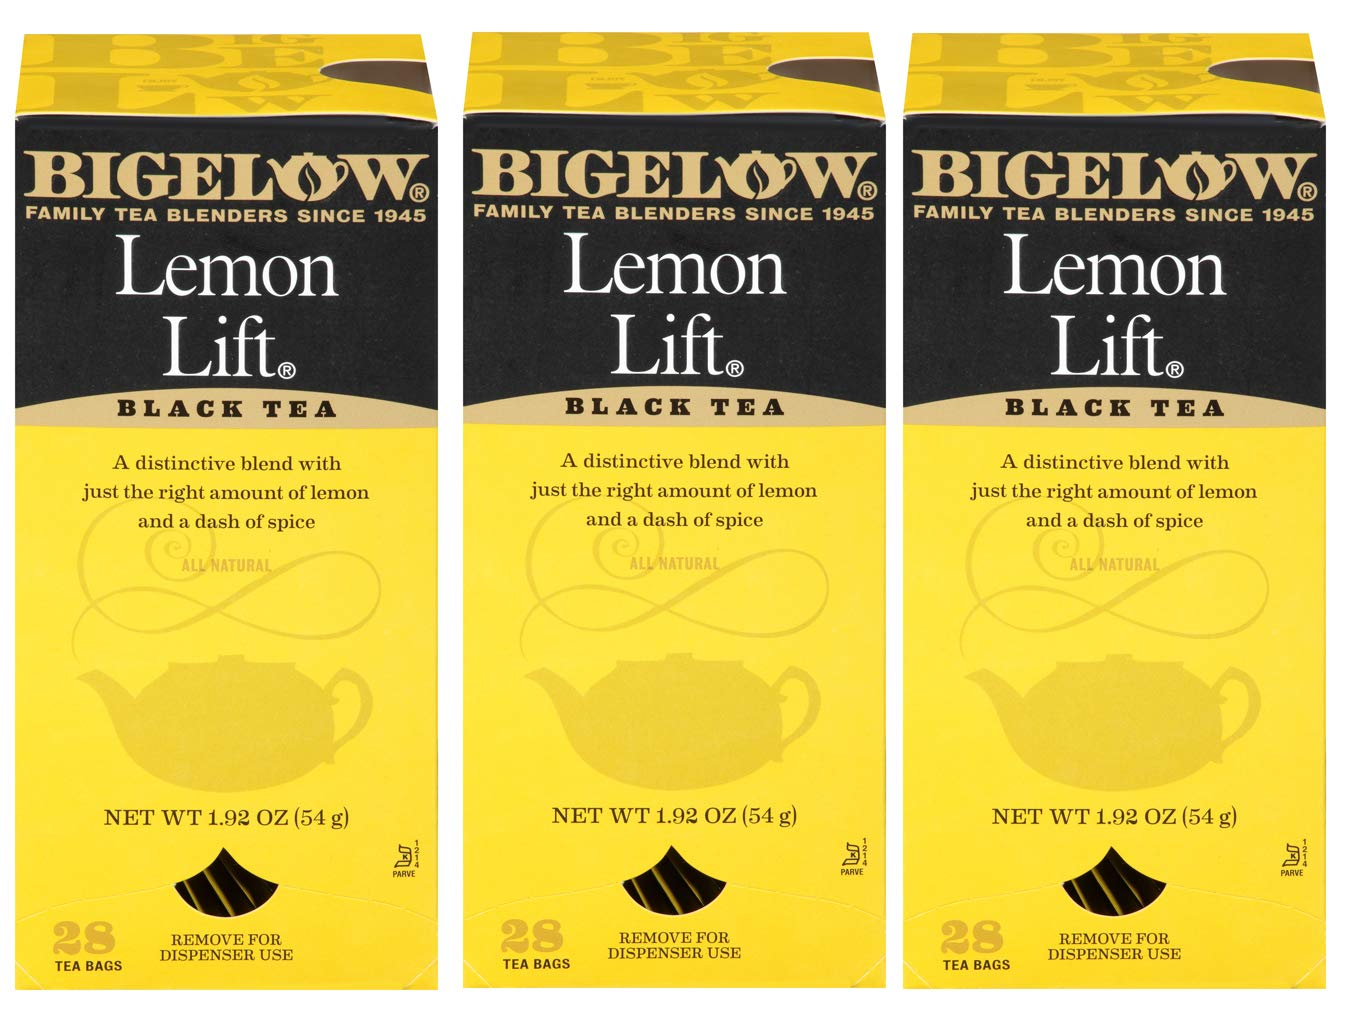 Bigelow Lemon Lift Black Tea Bags 28-Count Box (Pack of 3) Lemon Flavored Black Tea Naturally & Artificially Flavored